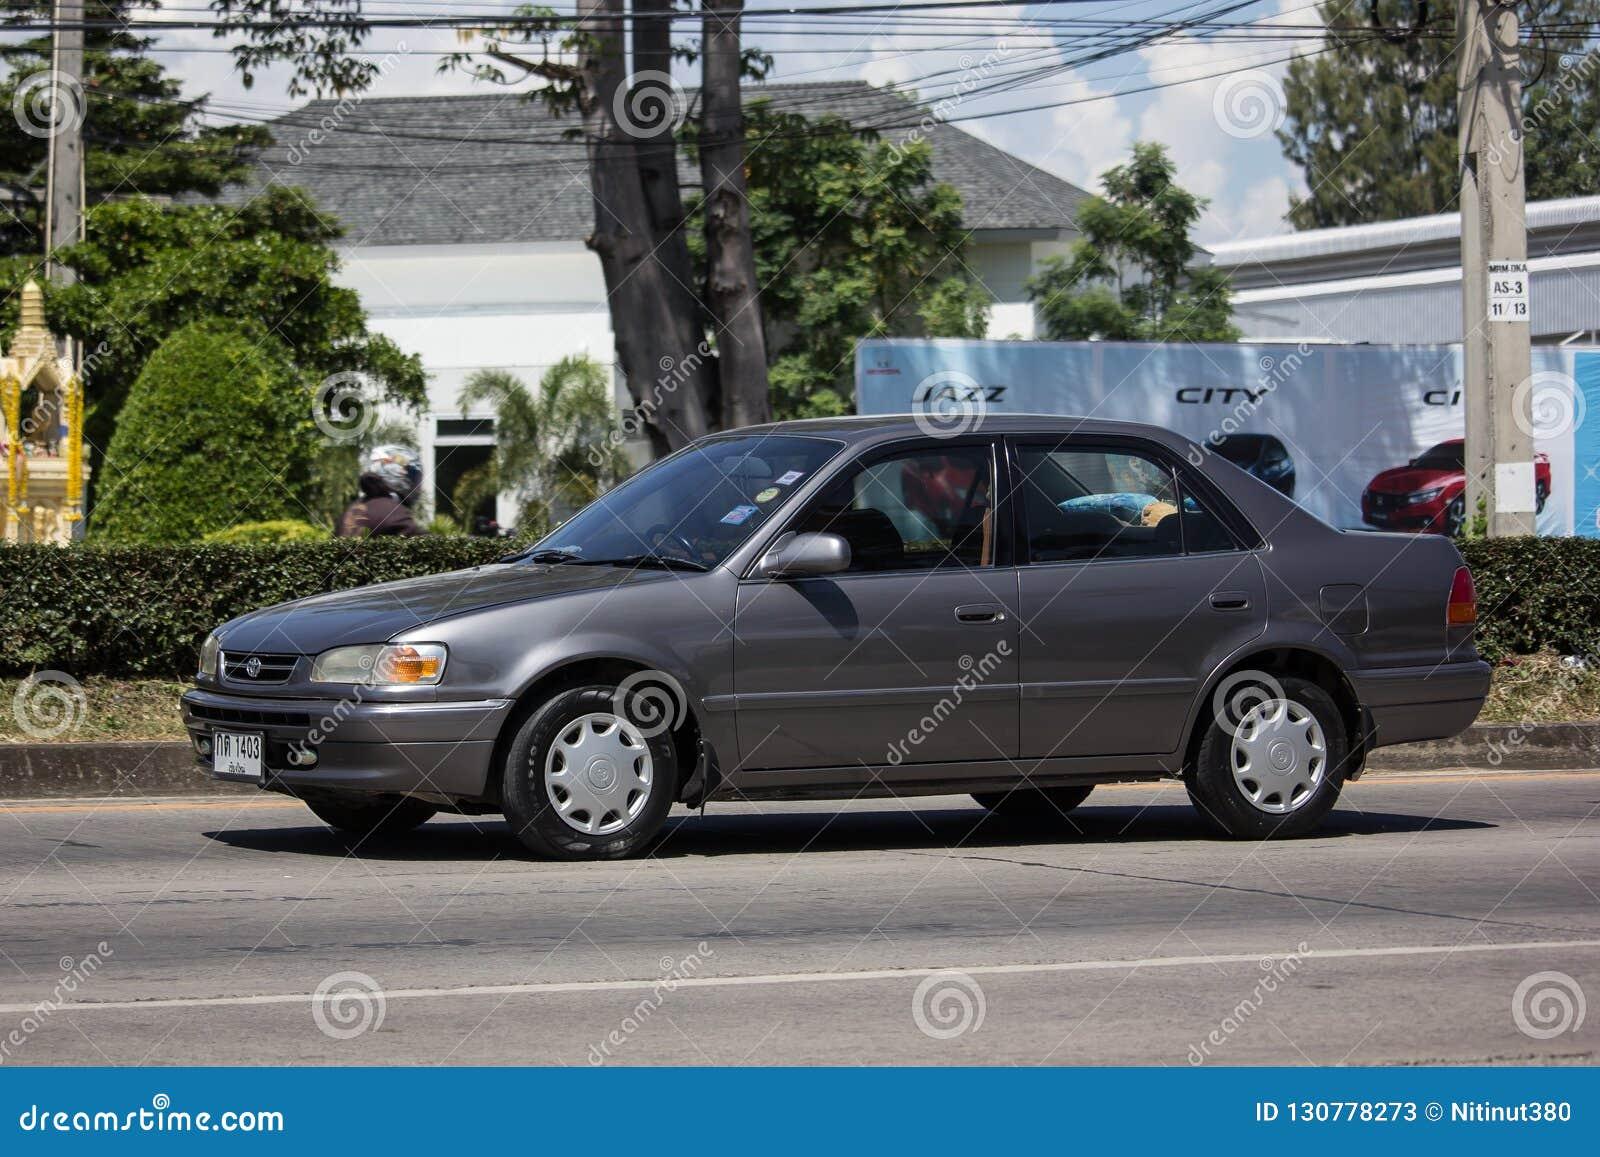 Vieille voiture privée, Toyota Corolla